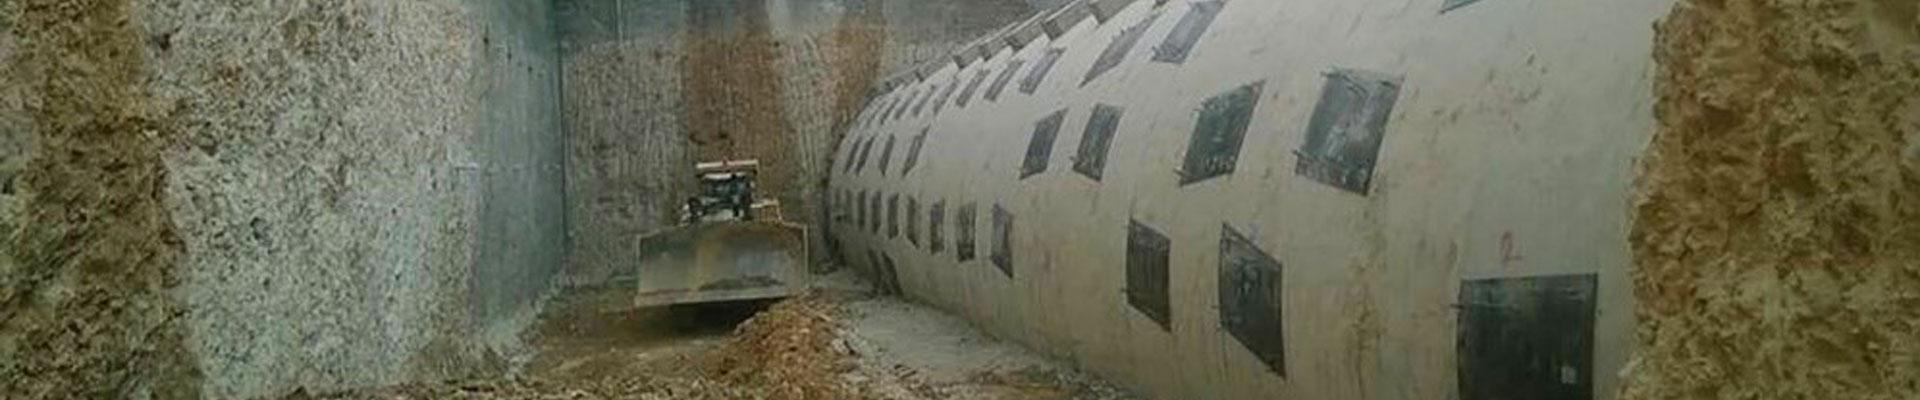 Metro de Riyadh Empresa de diseño geotécnico de túneles. Empresa de disseny geotècnic de túnels. Tunnel geotechnical design company.